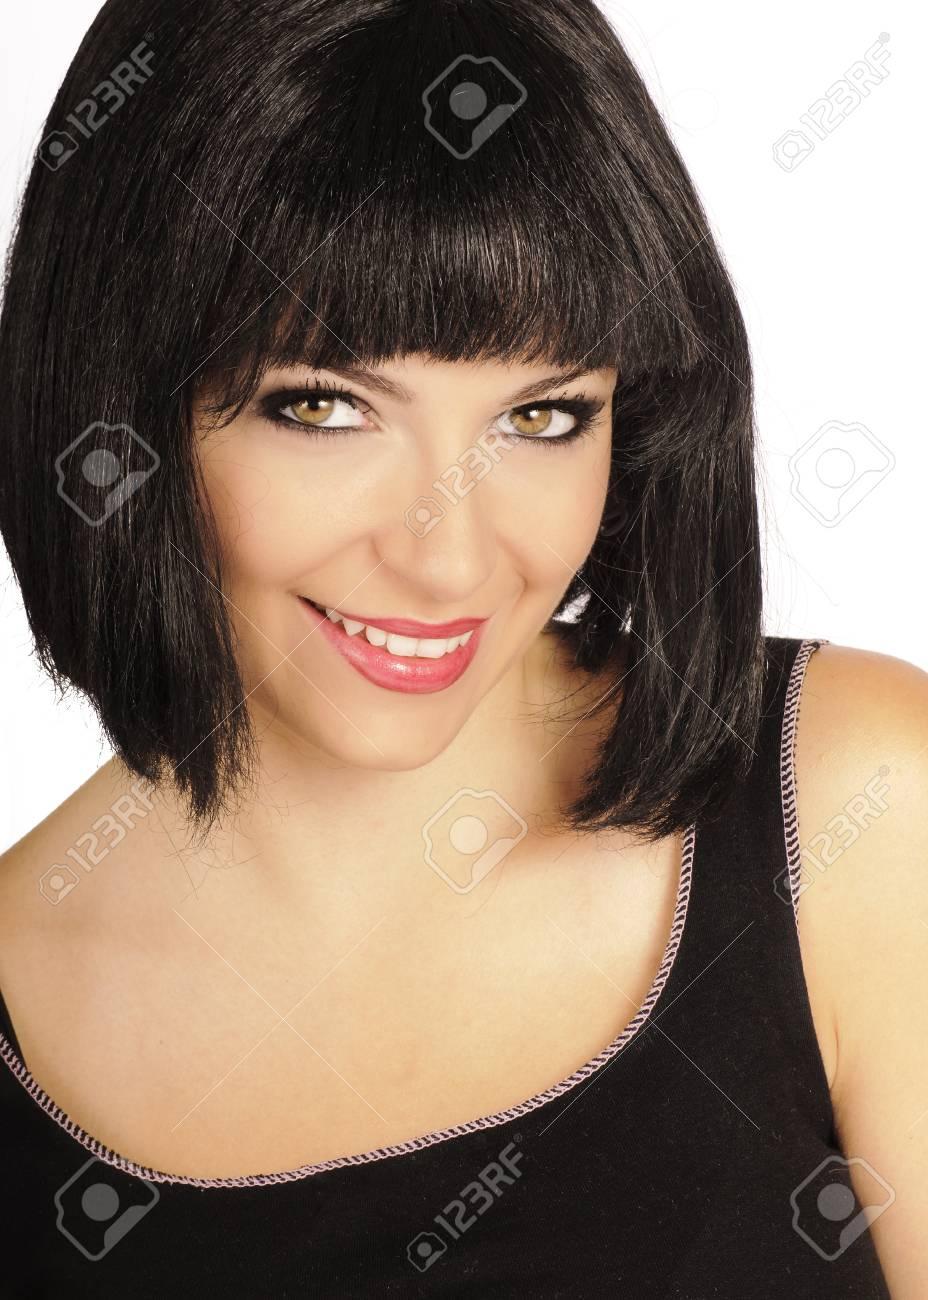 Beautiful girl smiling, isolated Stock Photo - 10883832